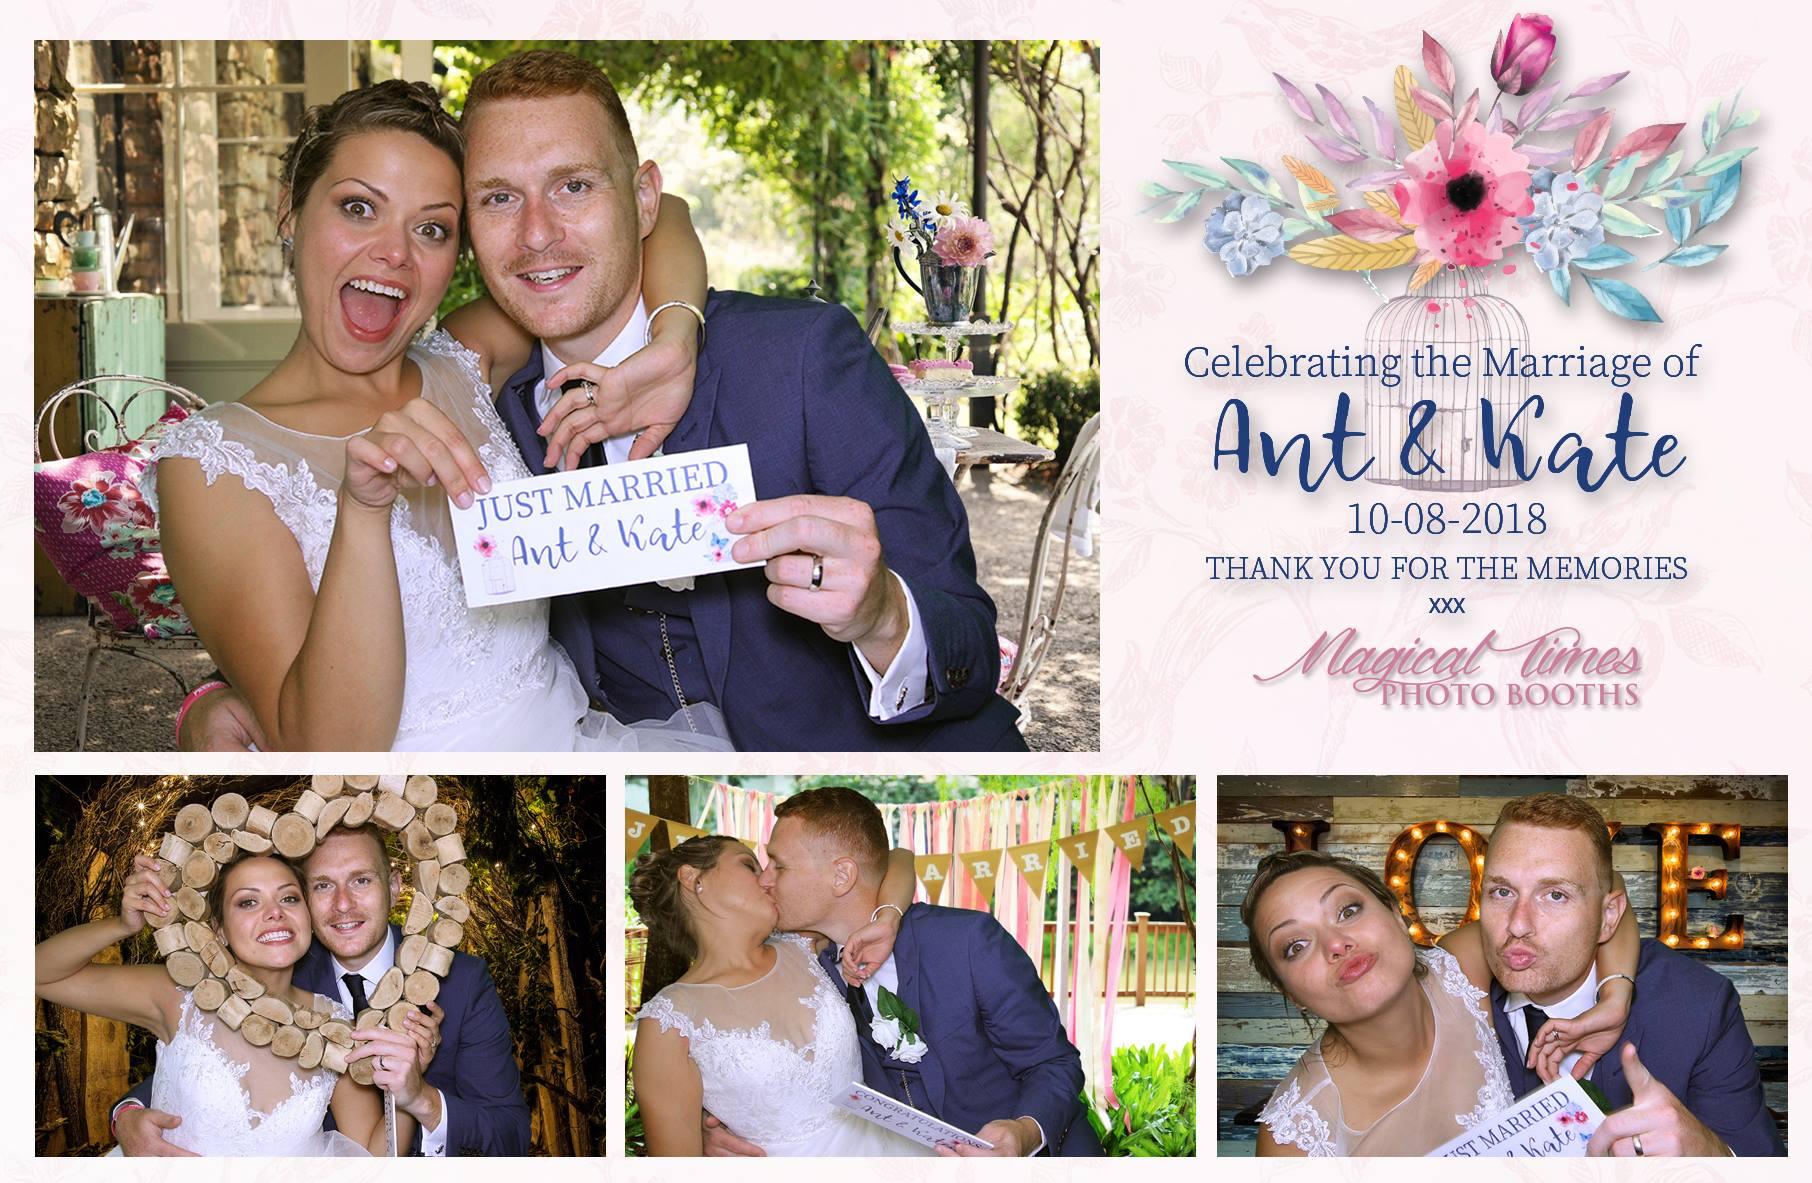 kent wedding photobooth.jpg